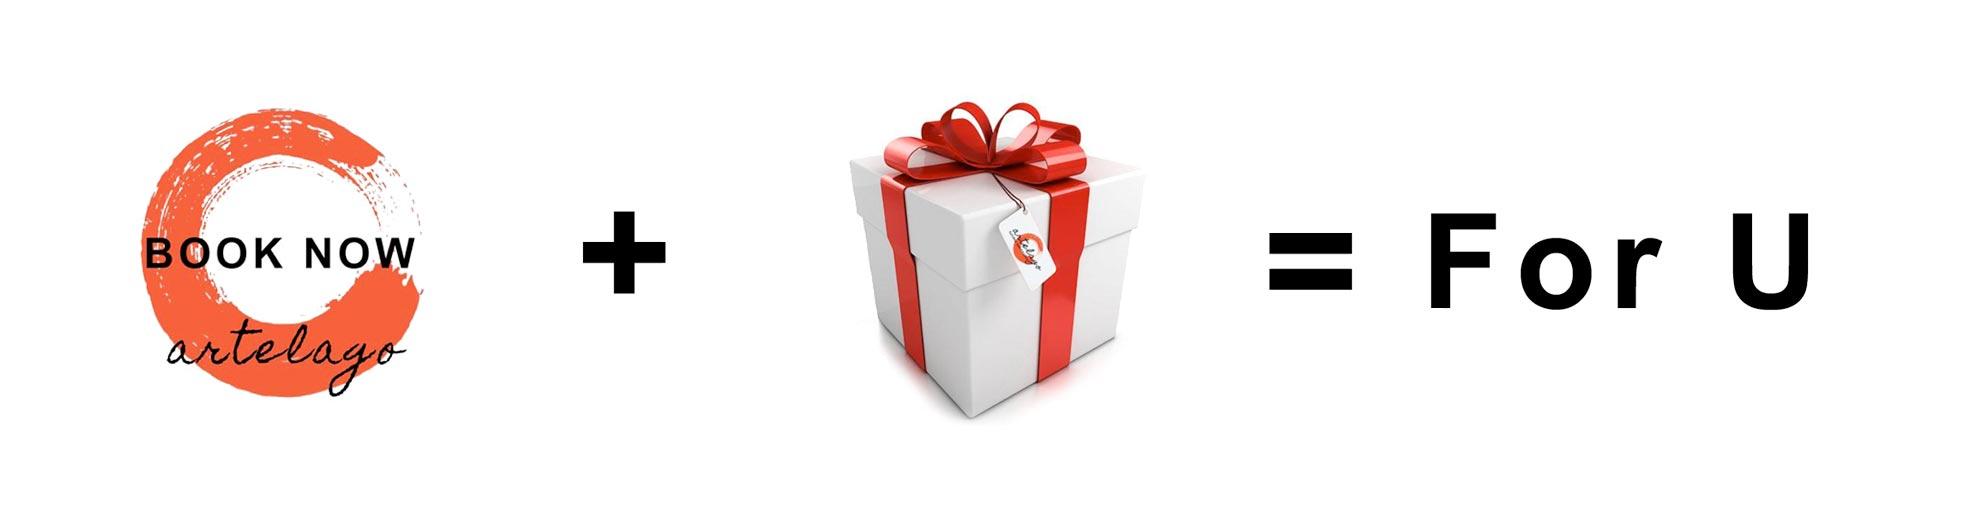 gift-regalo-artelago